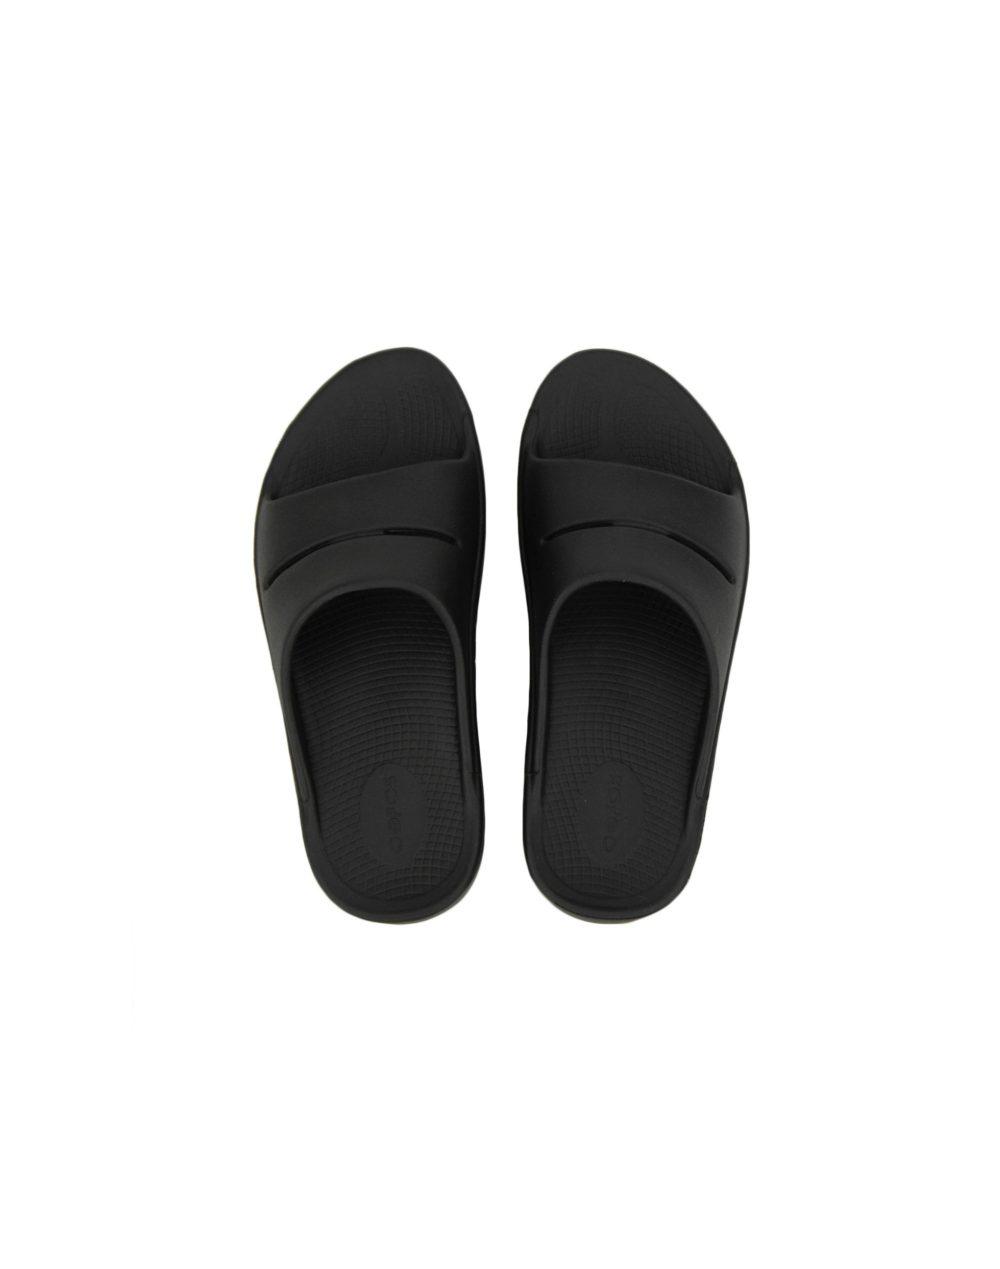 Oofos Ooahh (#1100) Black